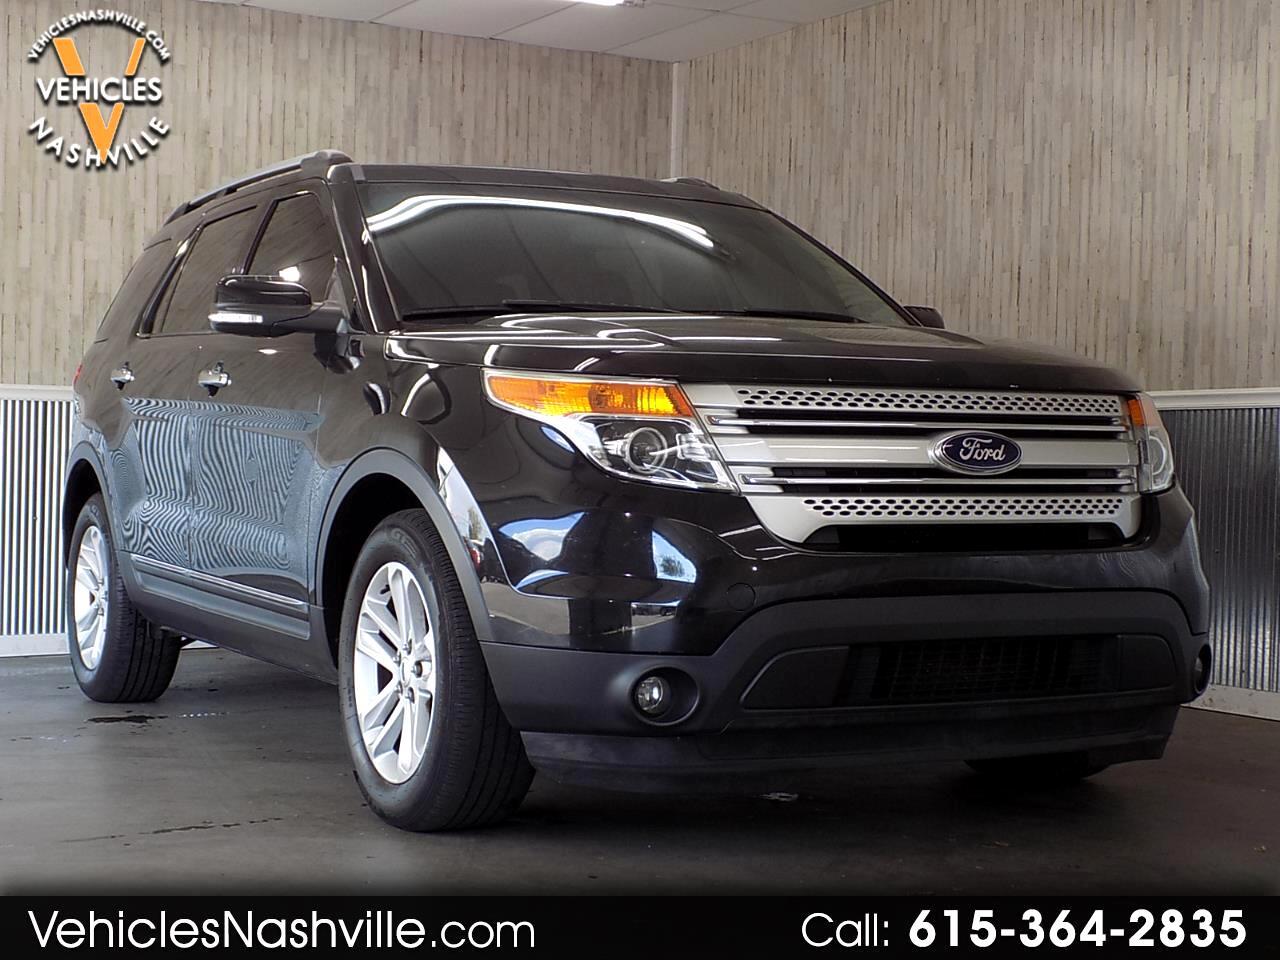 Ford Explorer XLT FWD 2015